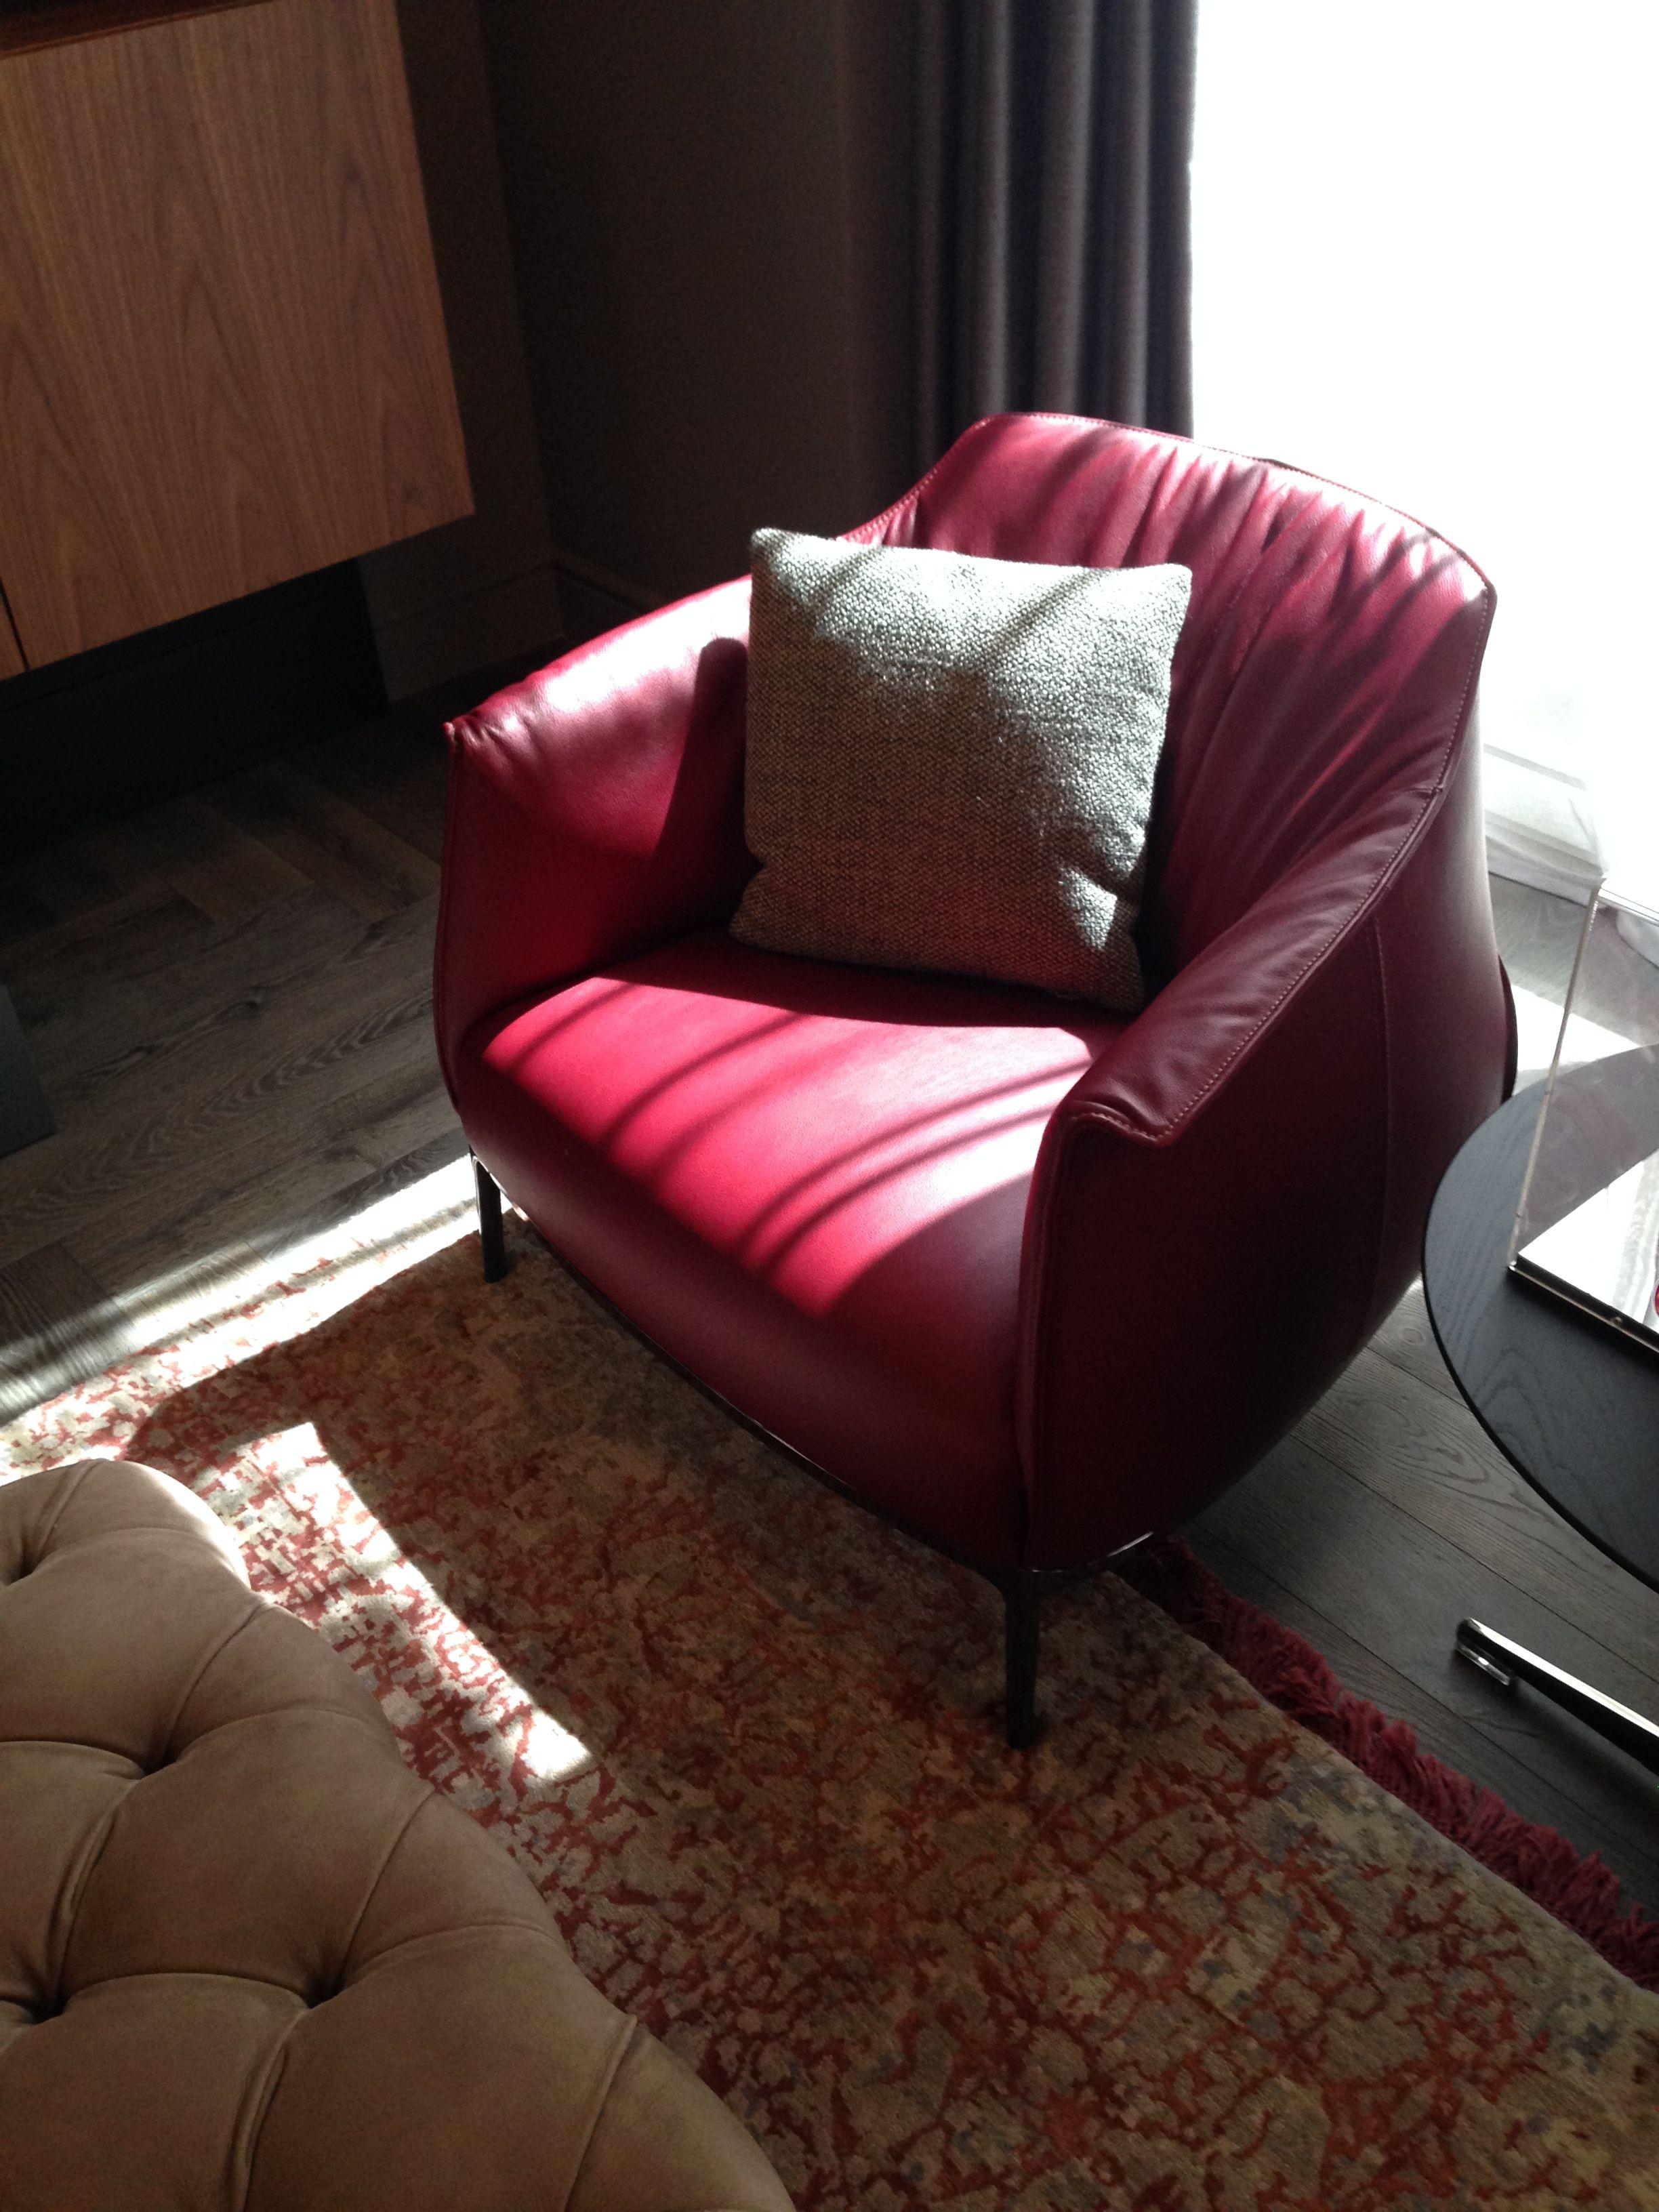 Poltrona Frau Salvioni Design (With images) Chaise sofa